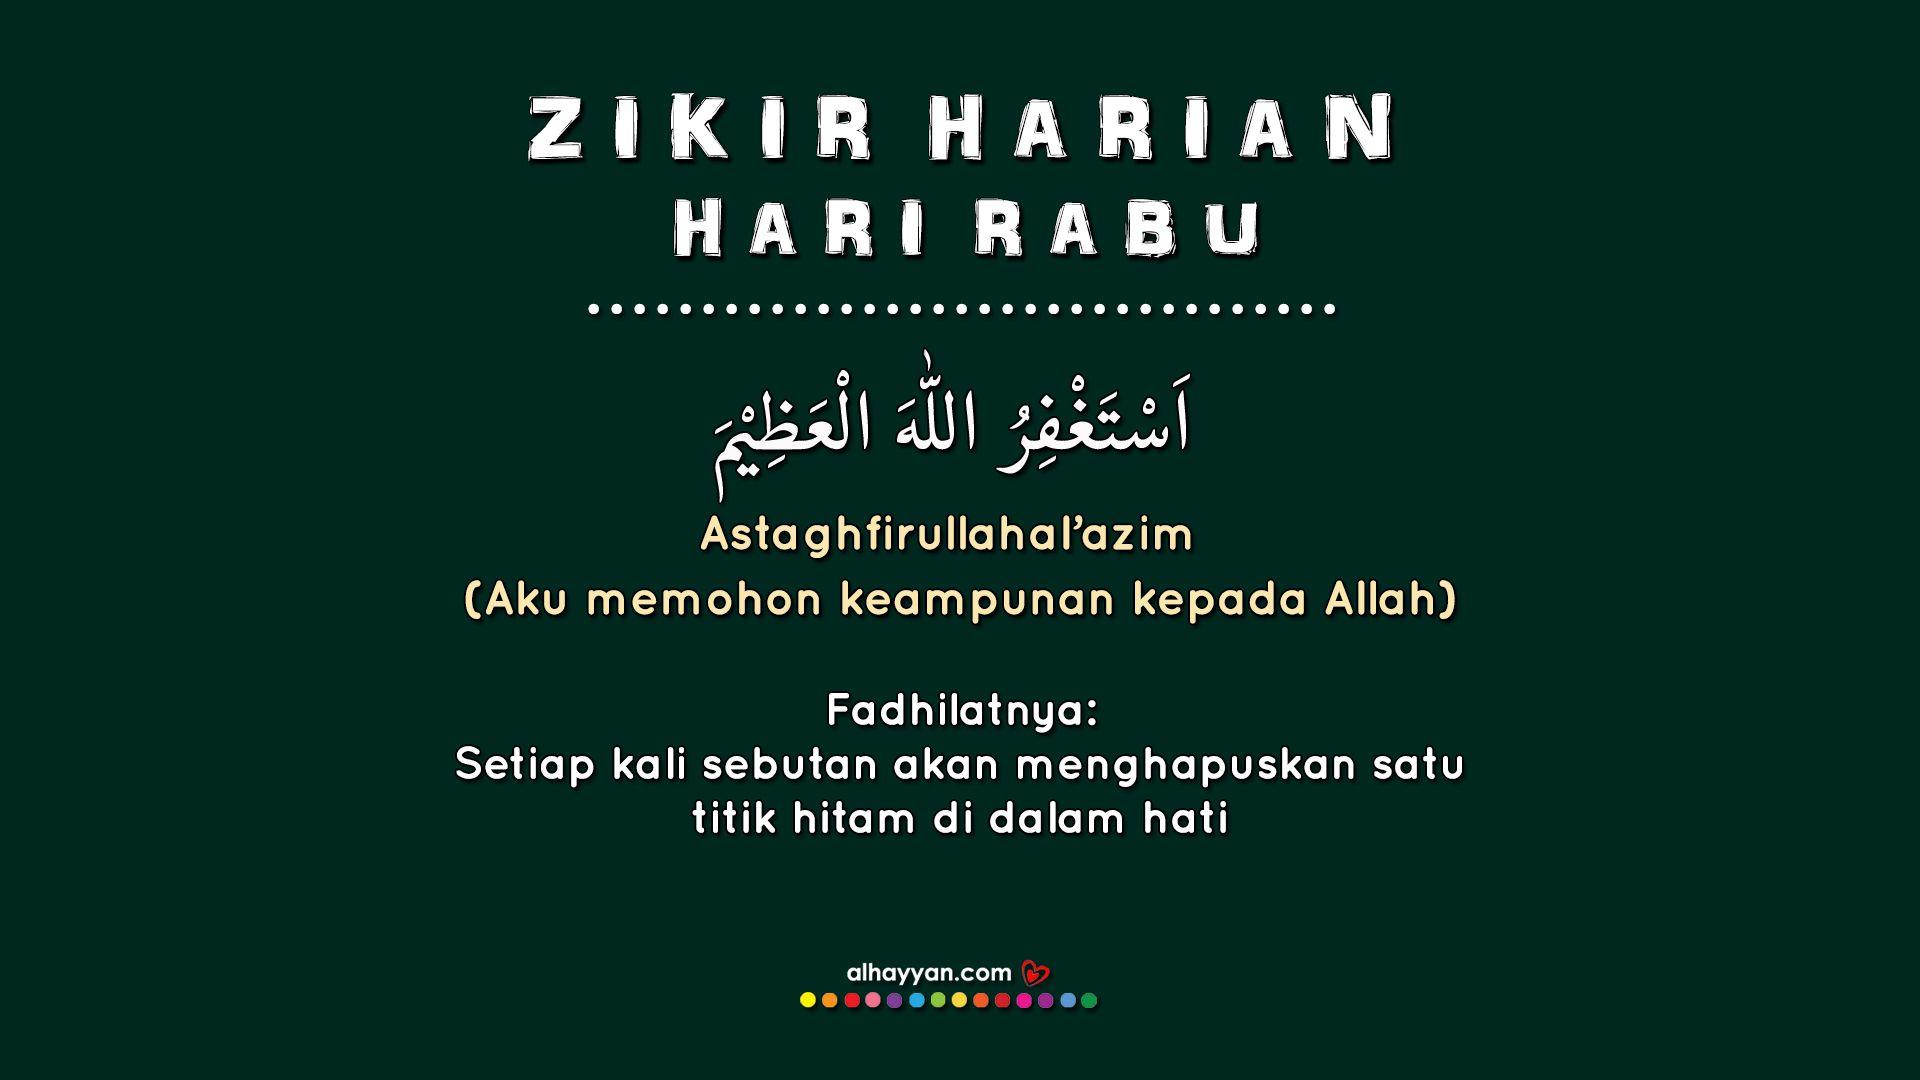 Zikir Harian Hari Rabu Rabu Allah Motivasi